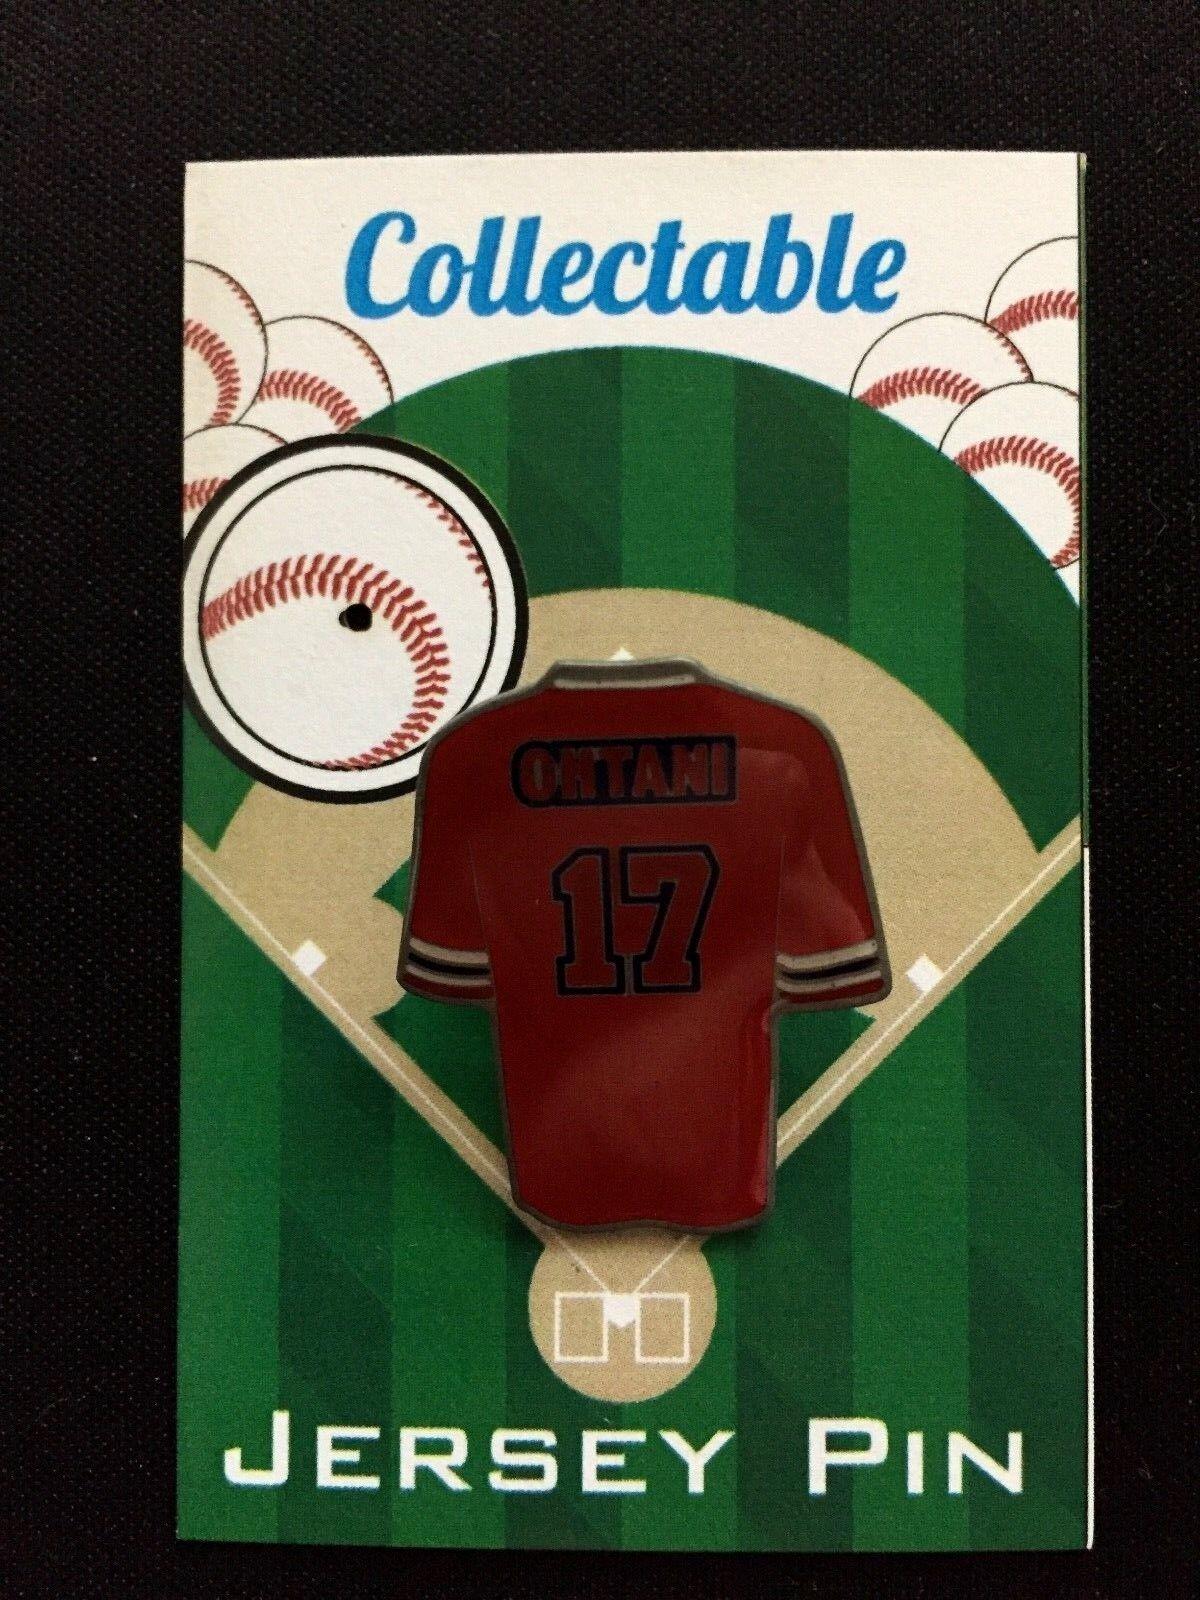 Los Angeles Shohei Ohtani Trikot Revers Pin-Collectible Klassiker-  1 Verkäufer  | Offizielle Webseite